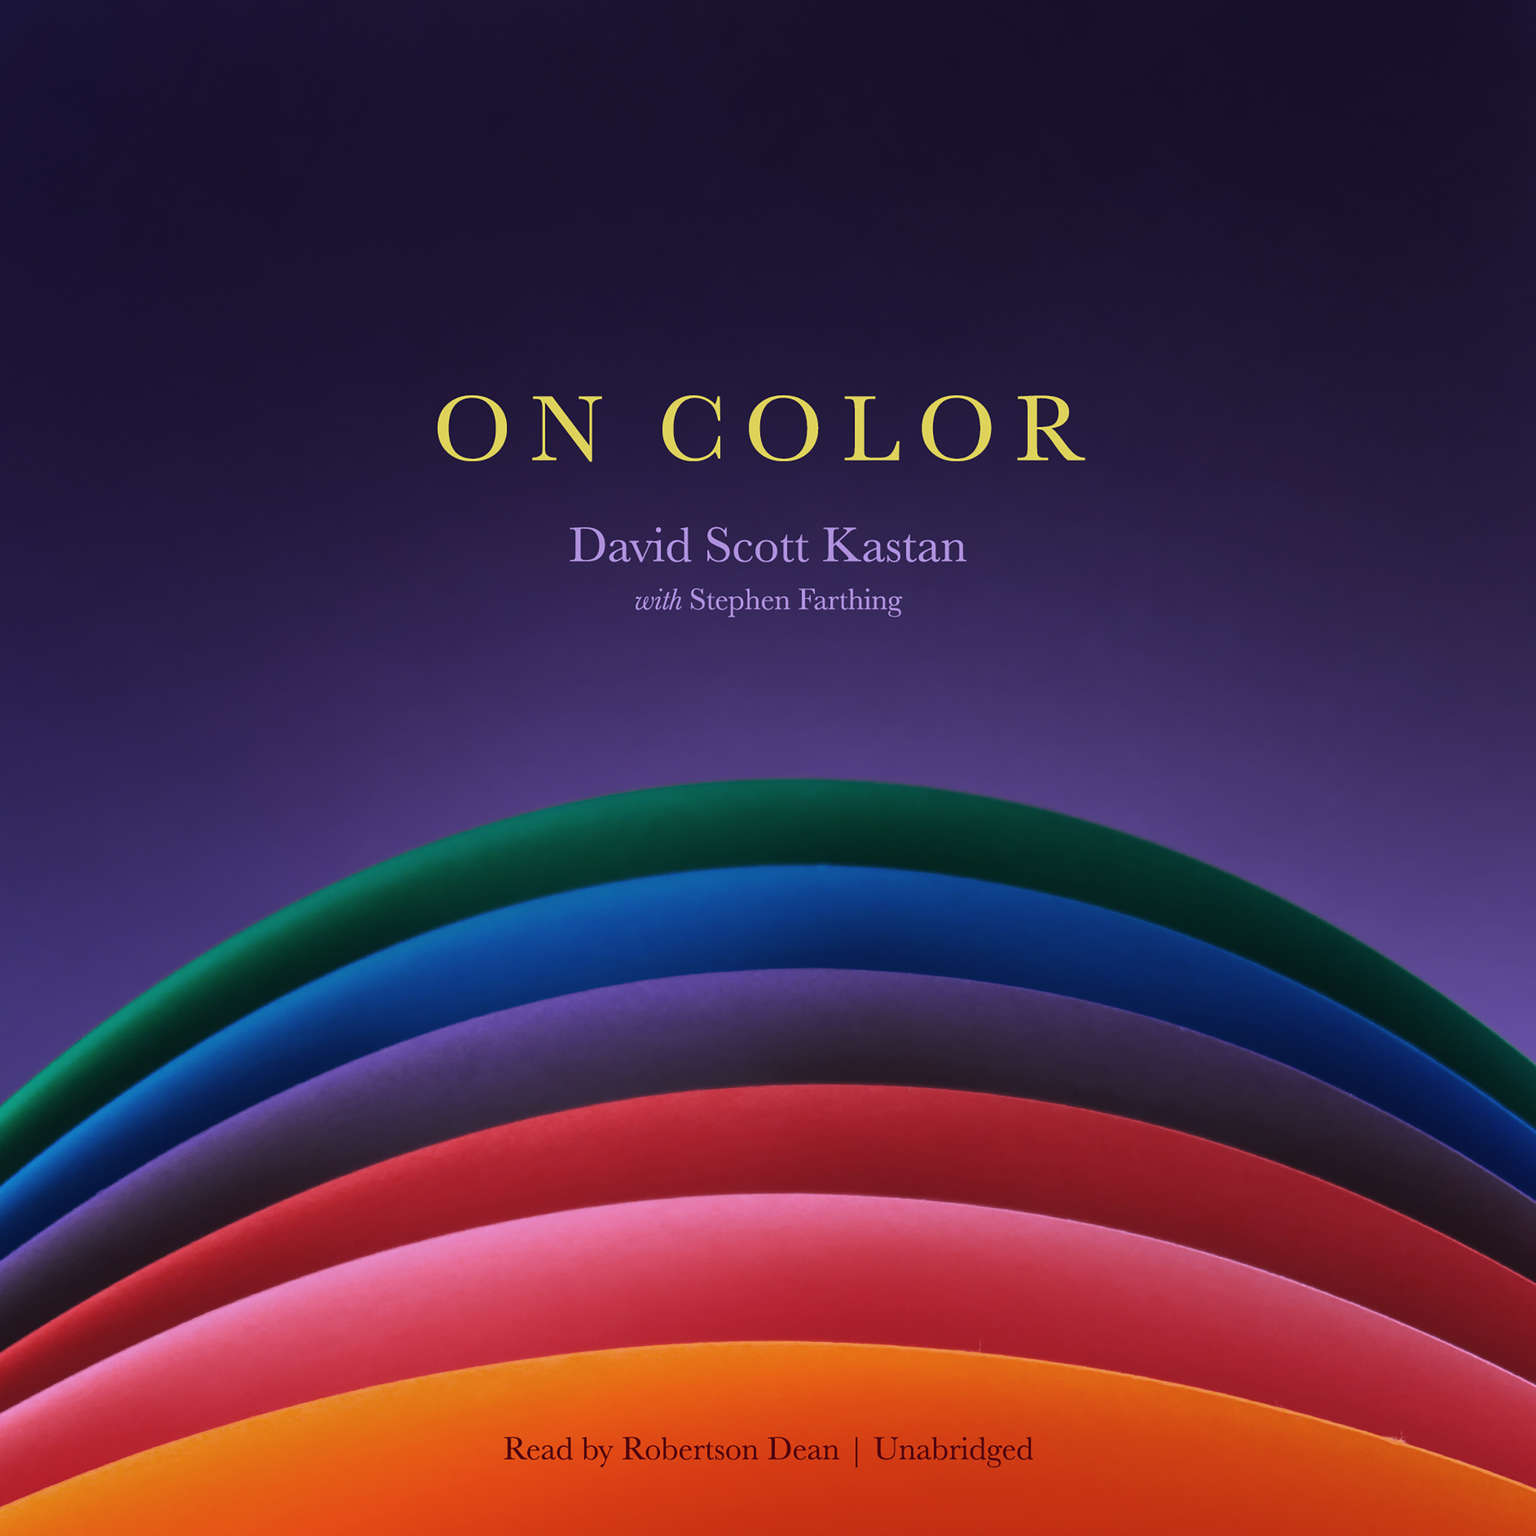 On Color Audiobook, by David Scott Kastan